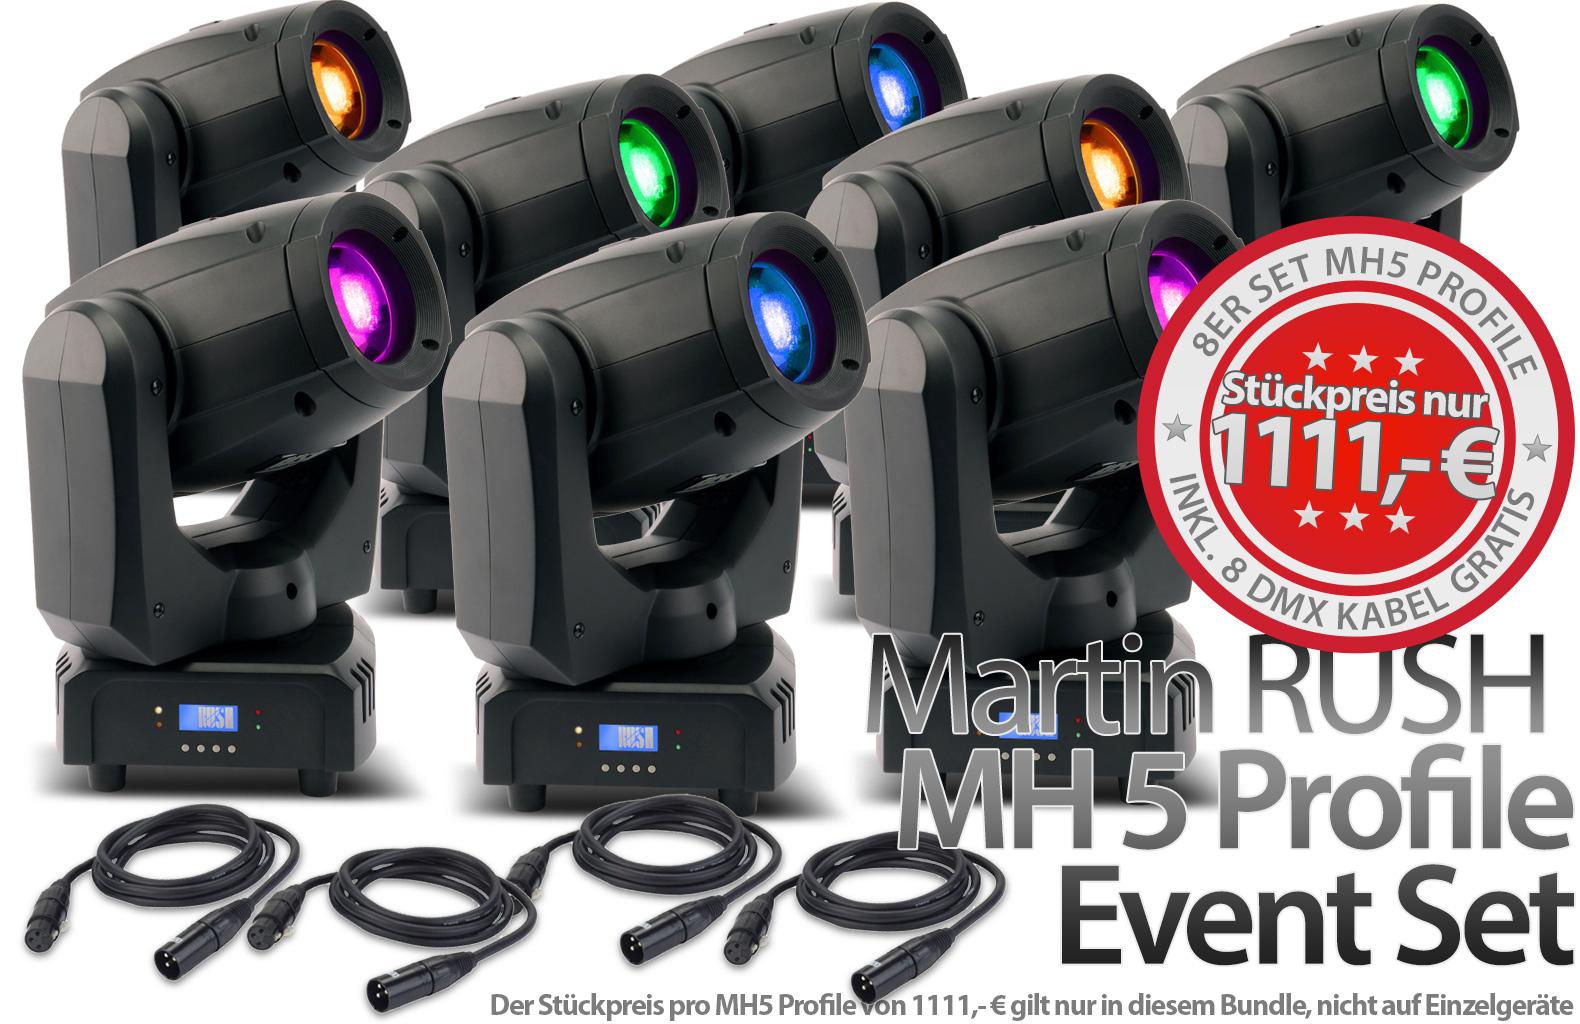 martin-rush-mh-5-profile-event-set